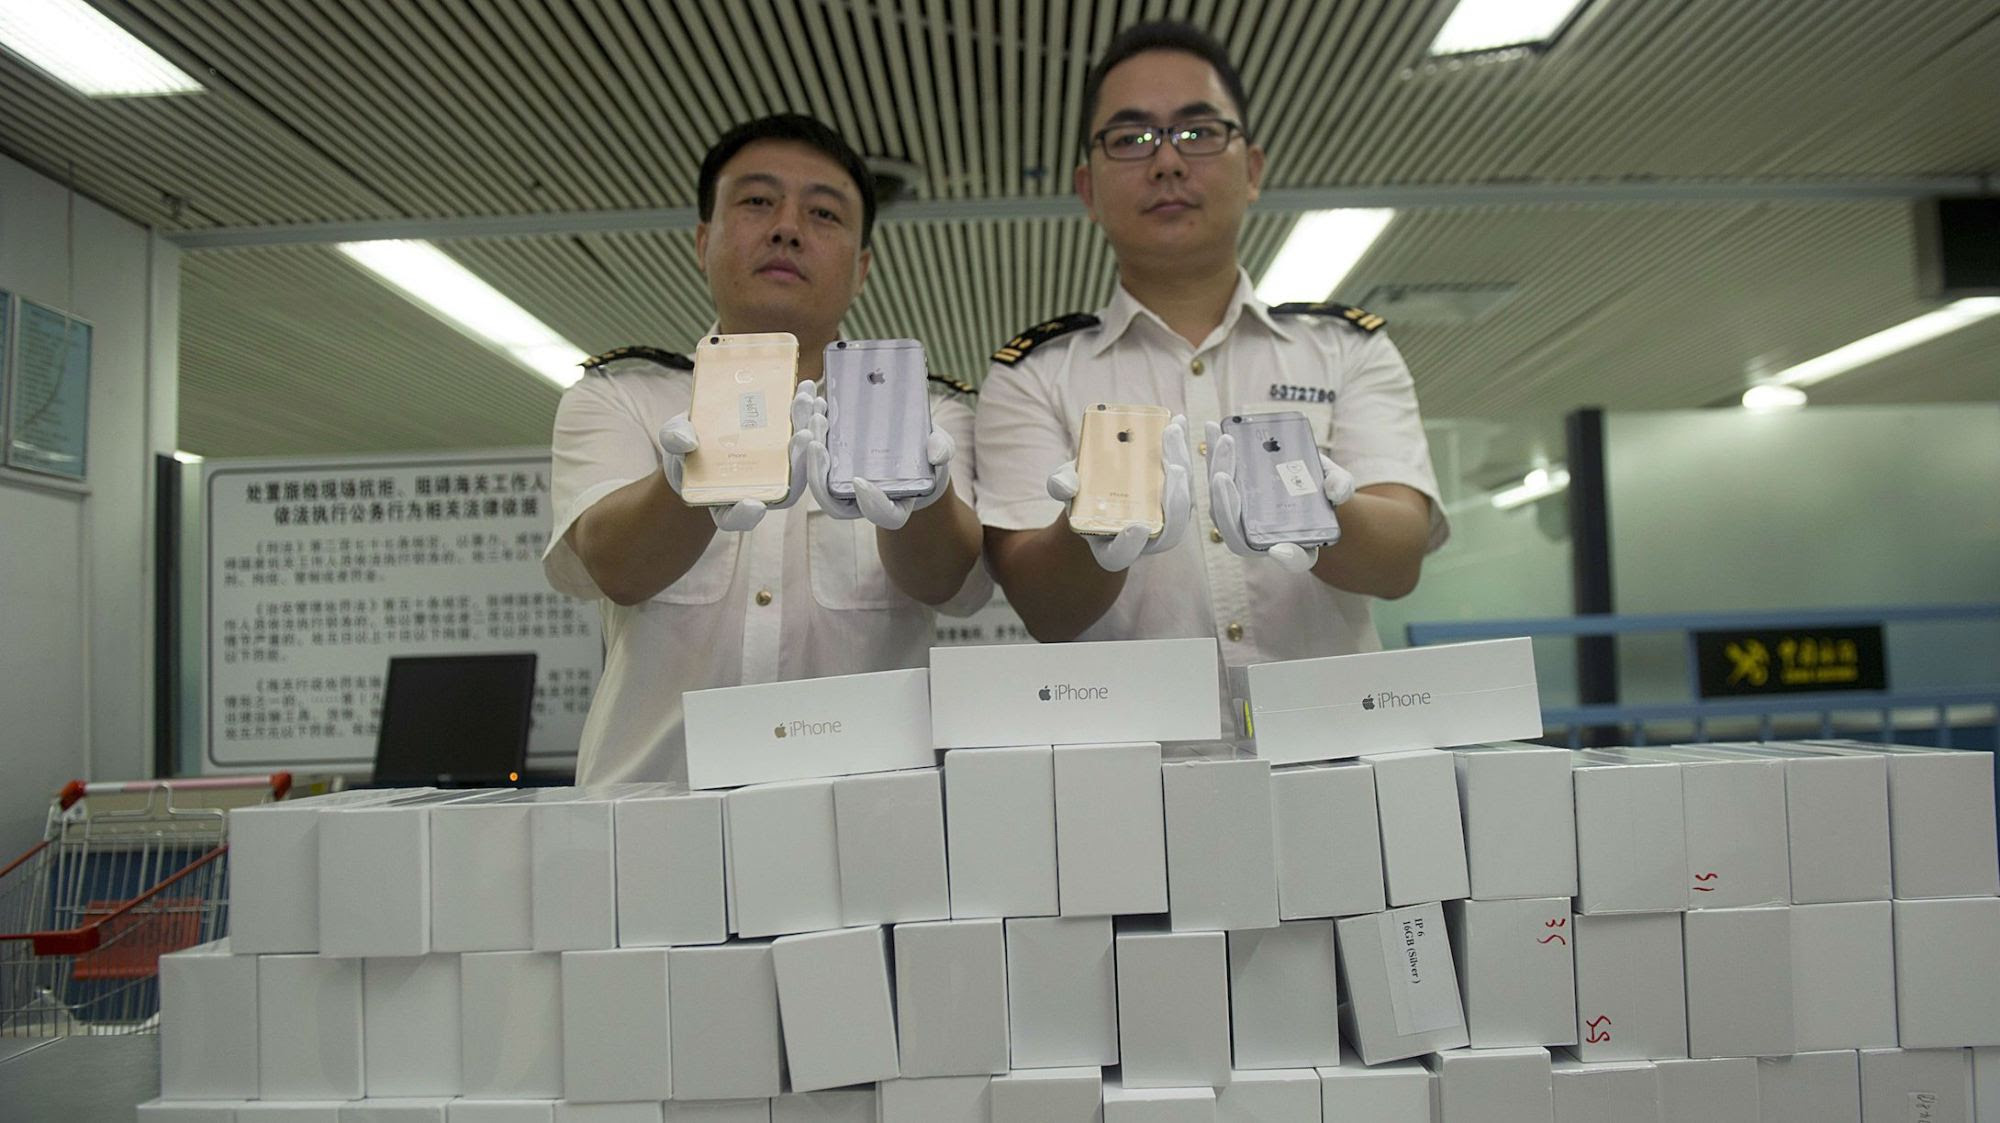 iphone-smuggling-hk-web-1